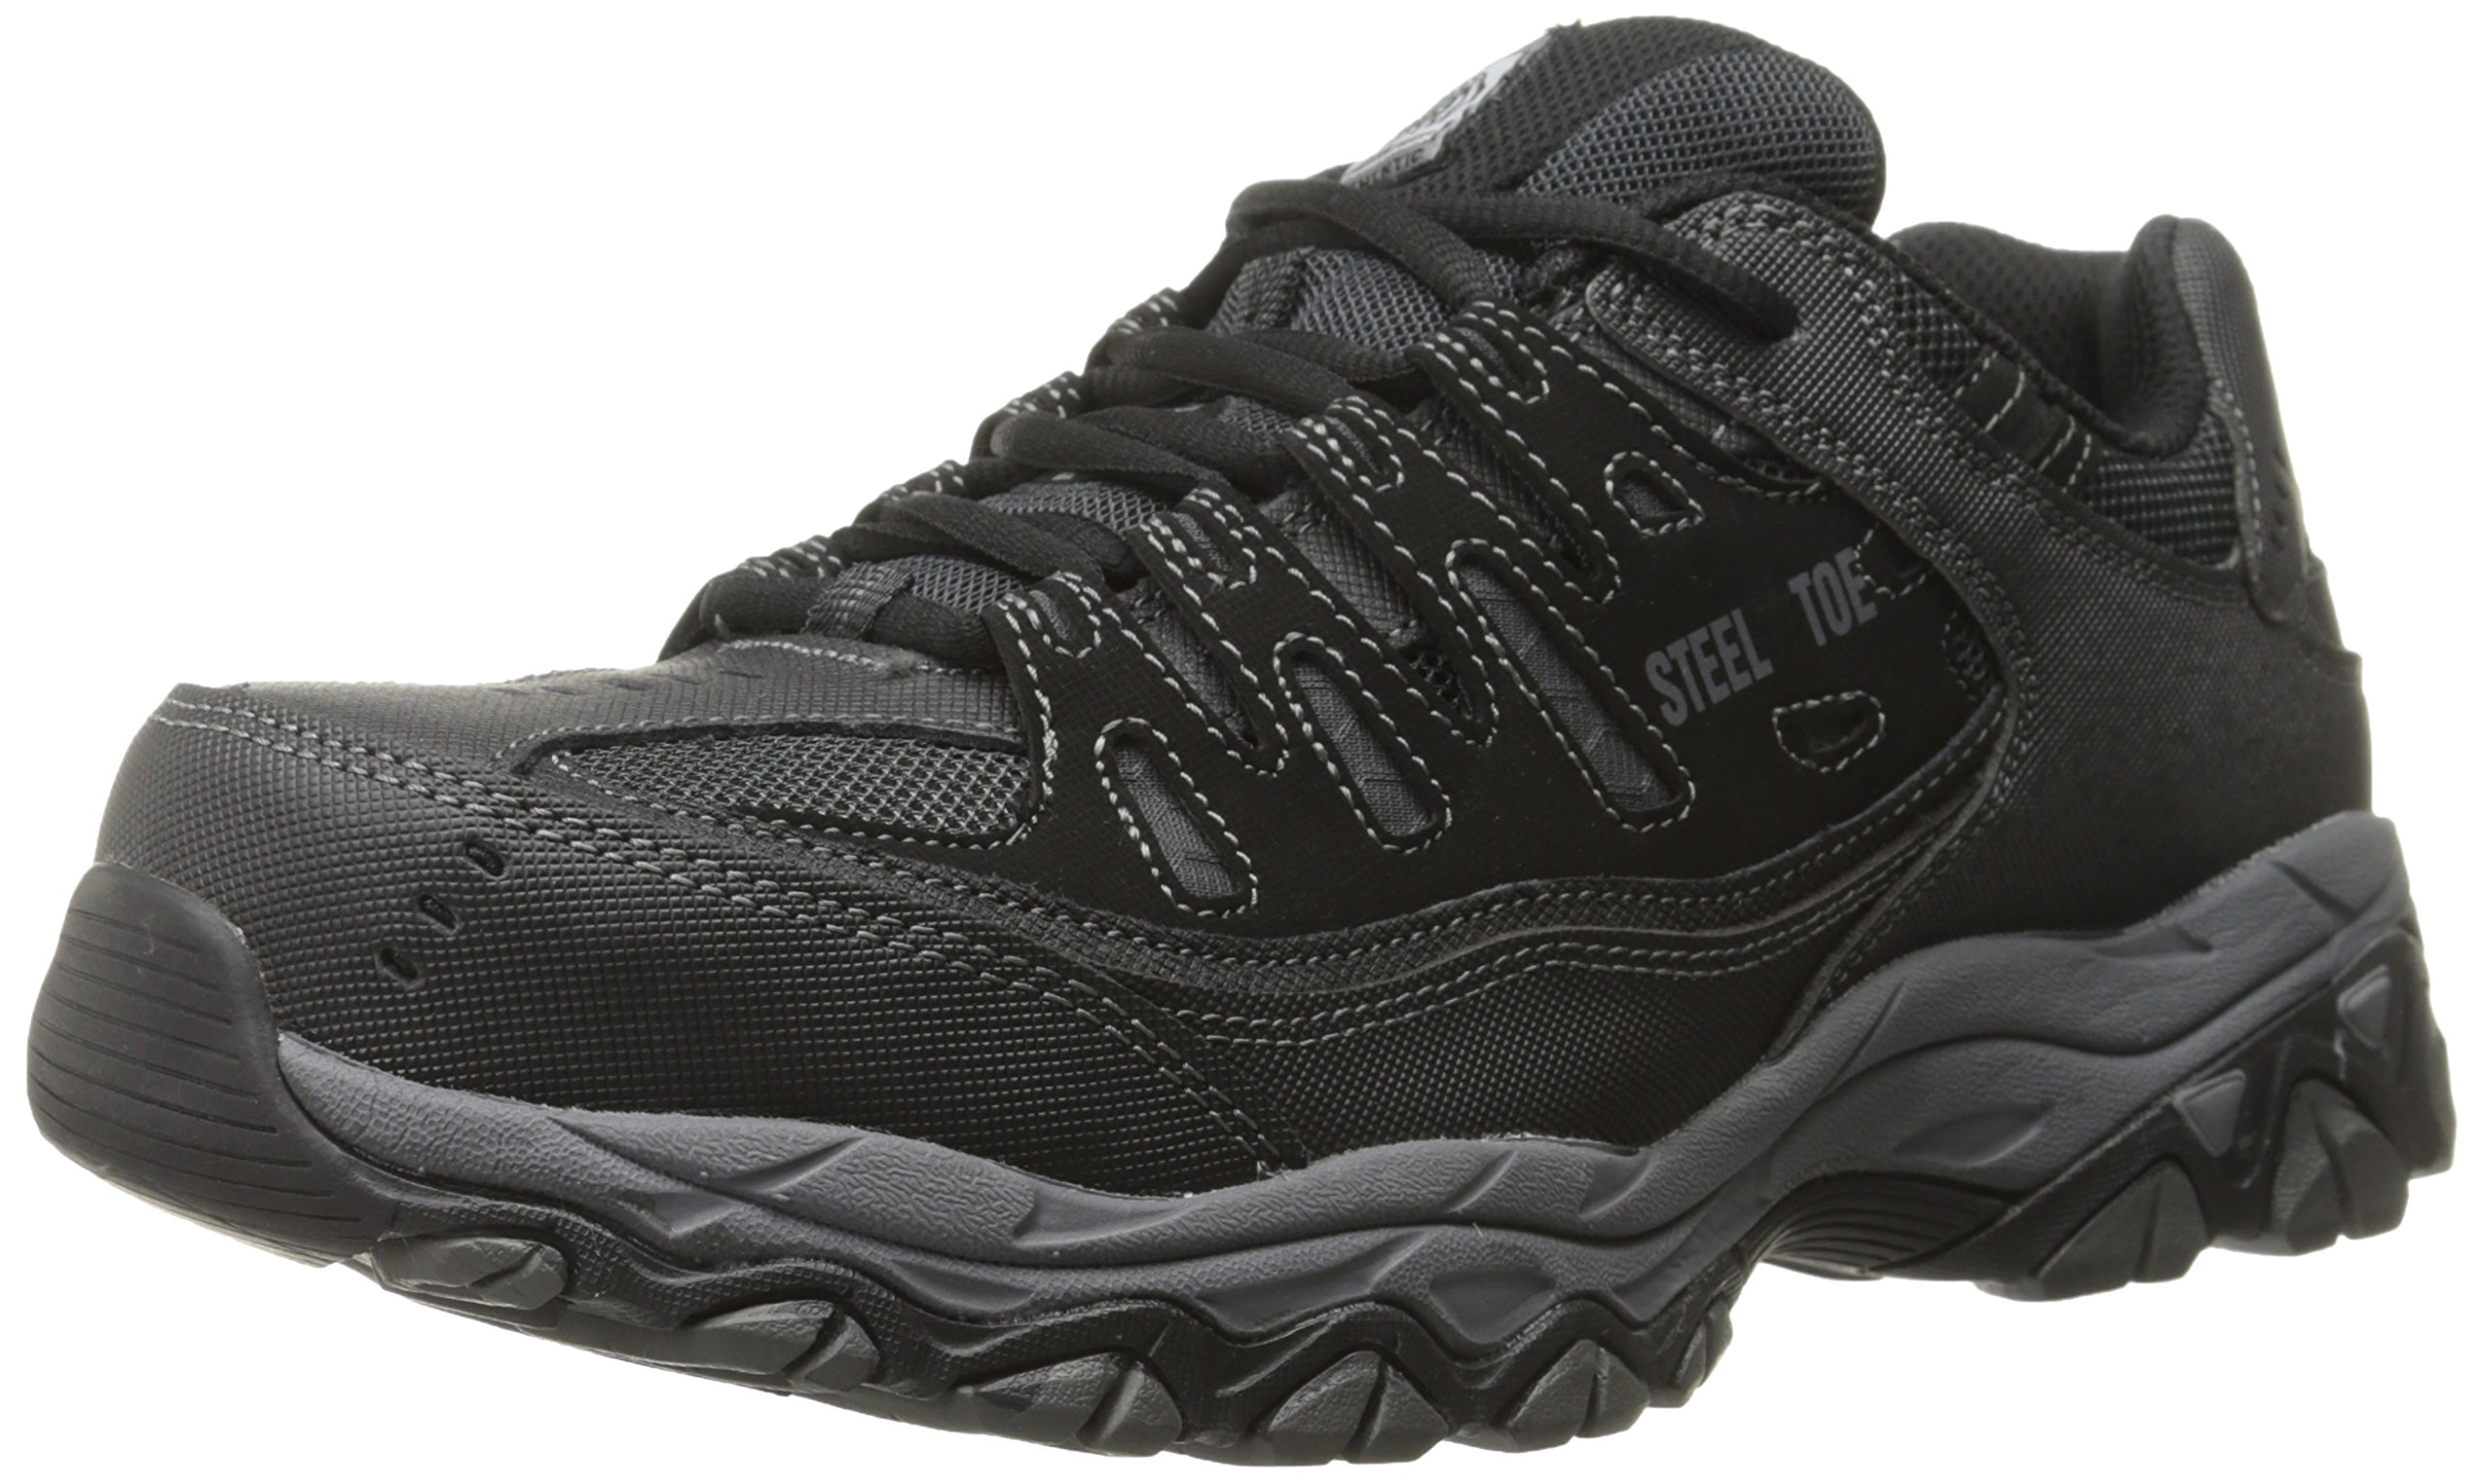 Skechers For Casual Steel Toe Work Sneaker, Black/Charcoal, 10.5 M US by Skechers